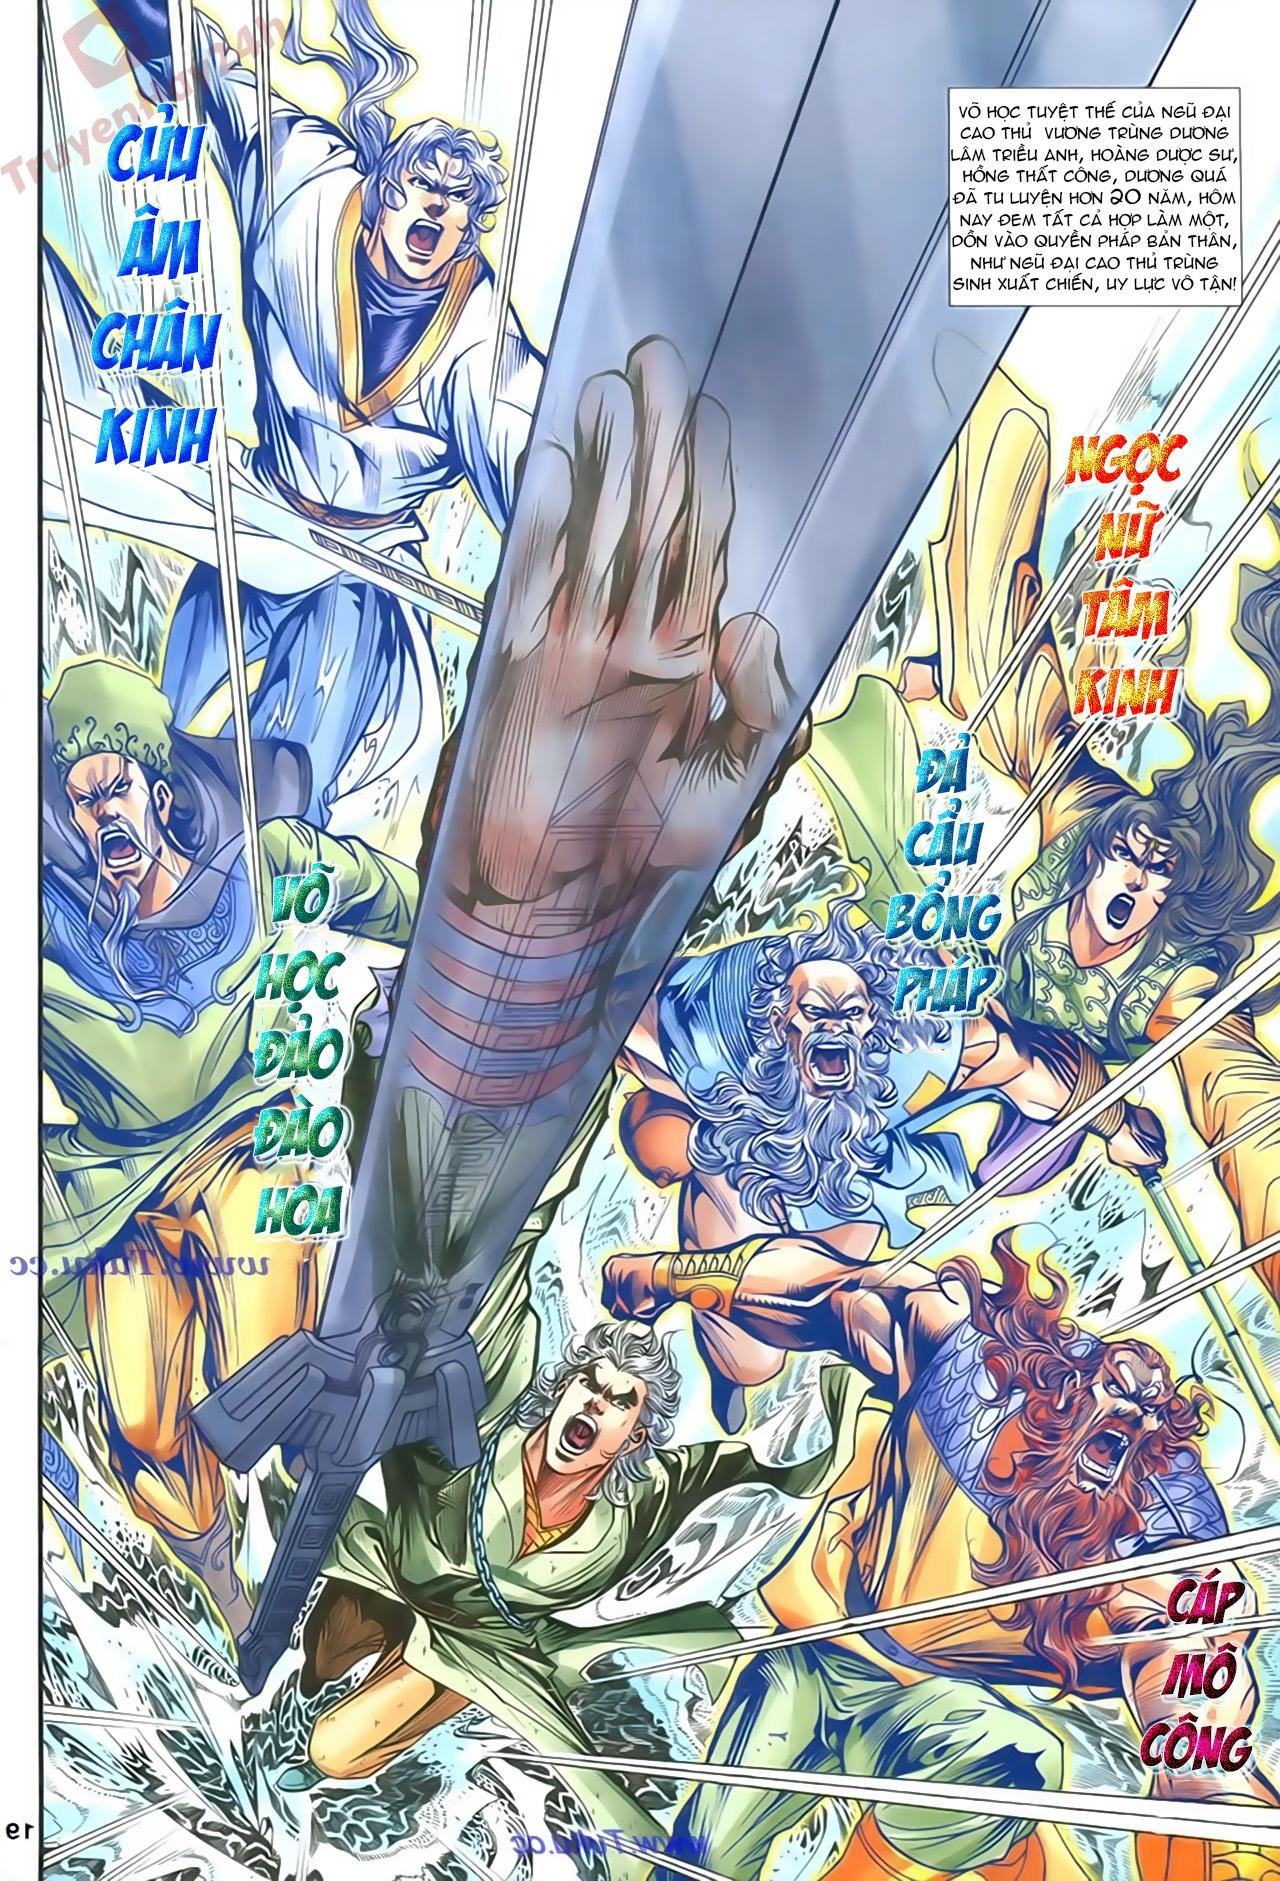 Thần Điêu Hiệp Lữ chap 86 – End Trang 19 - Mangak.info